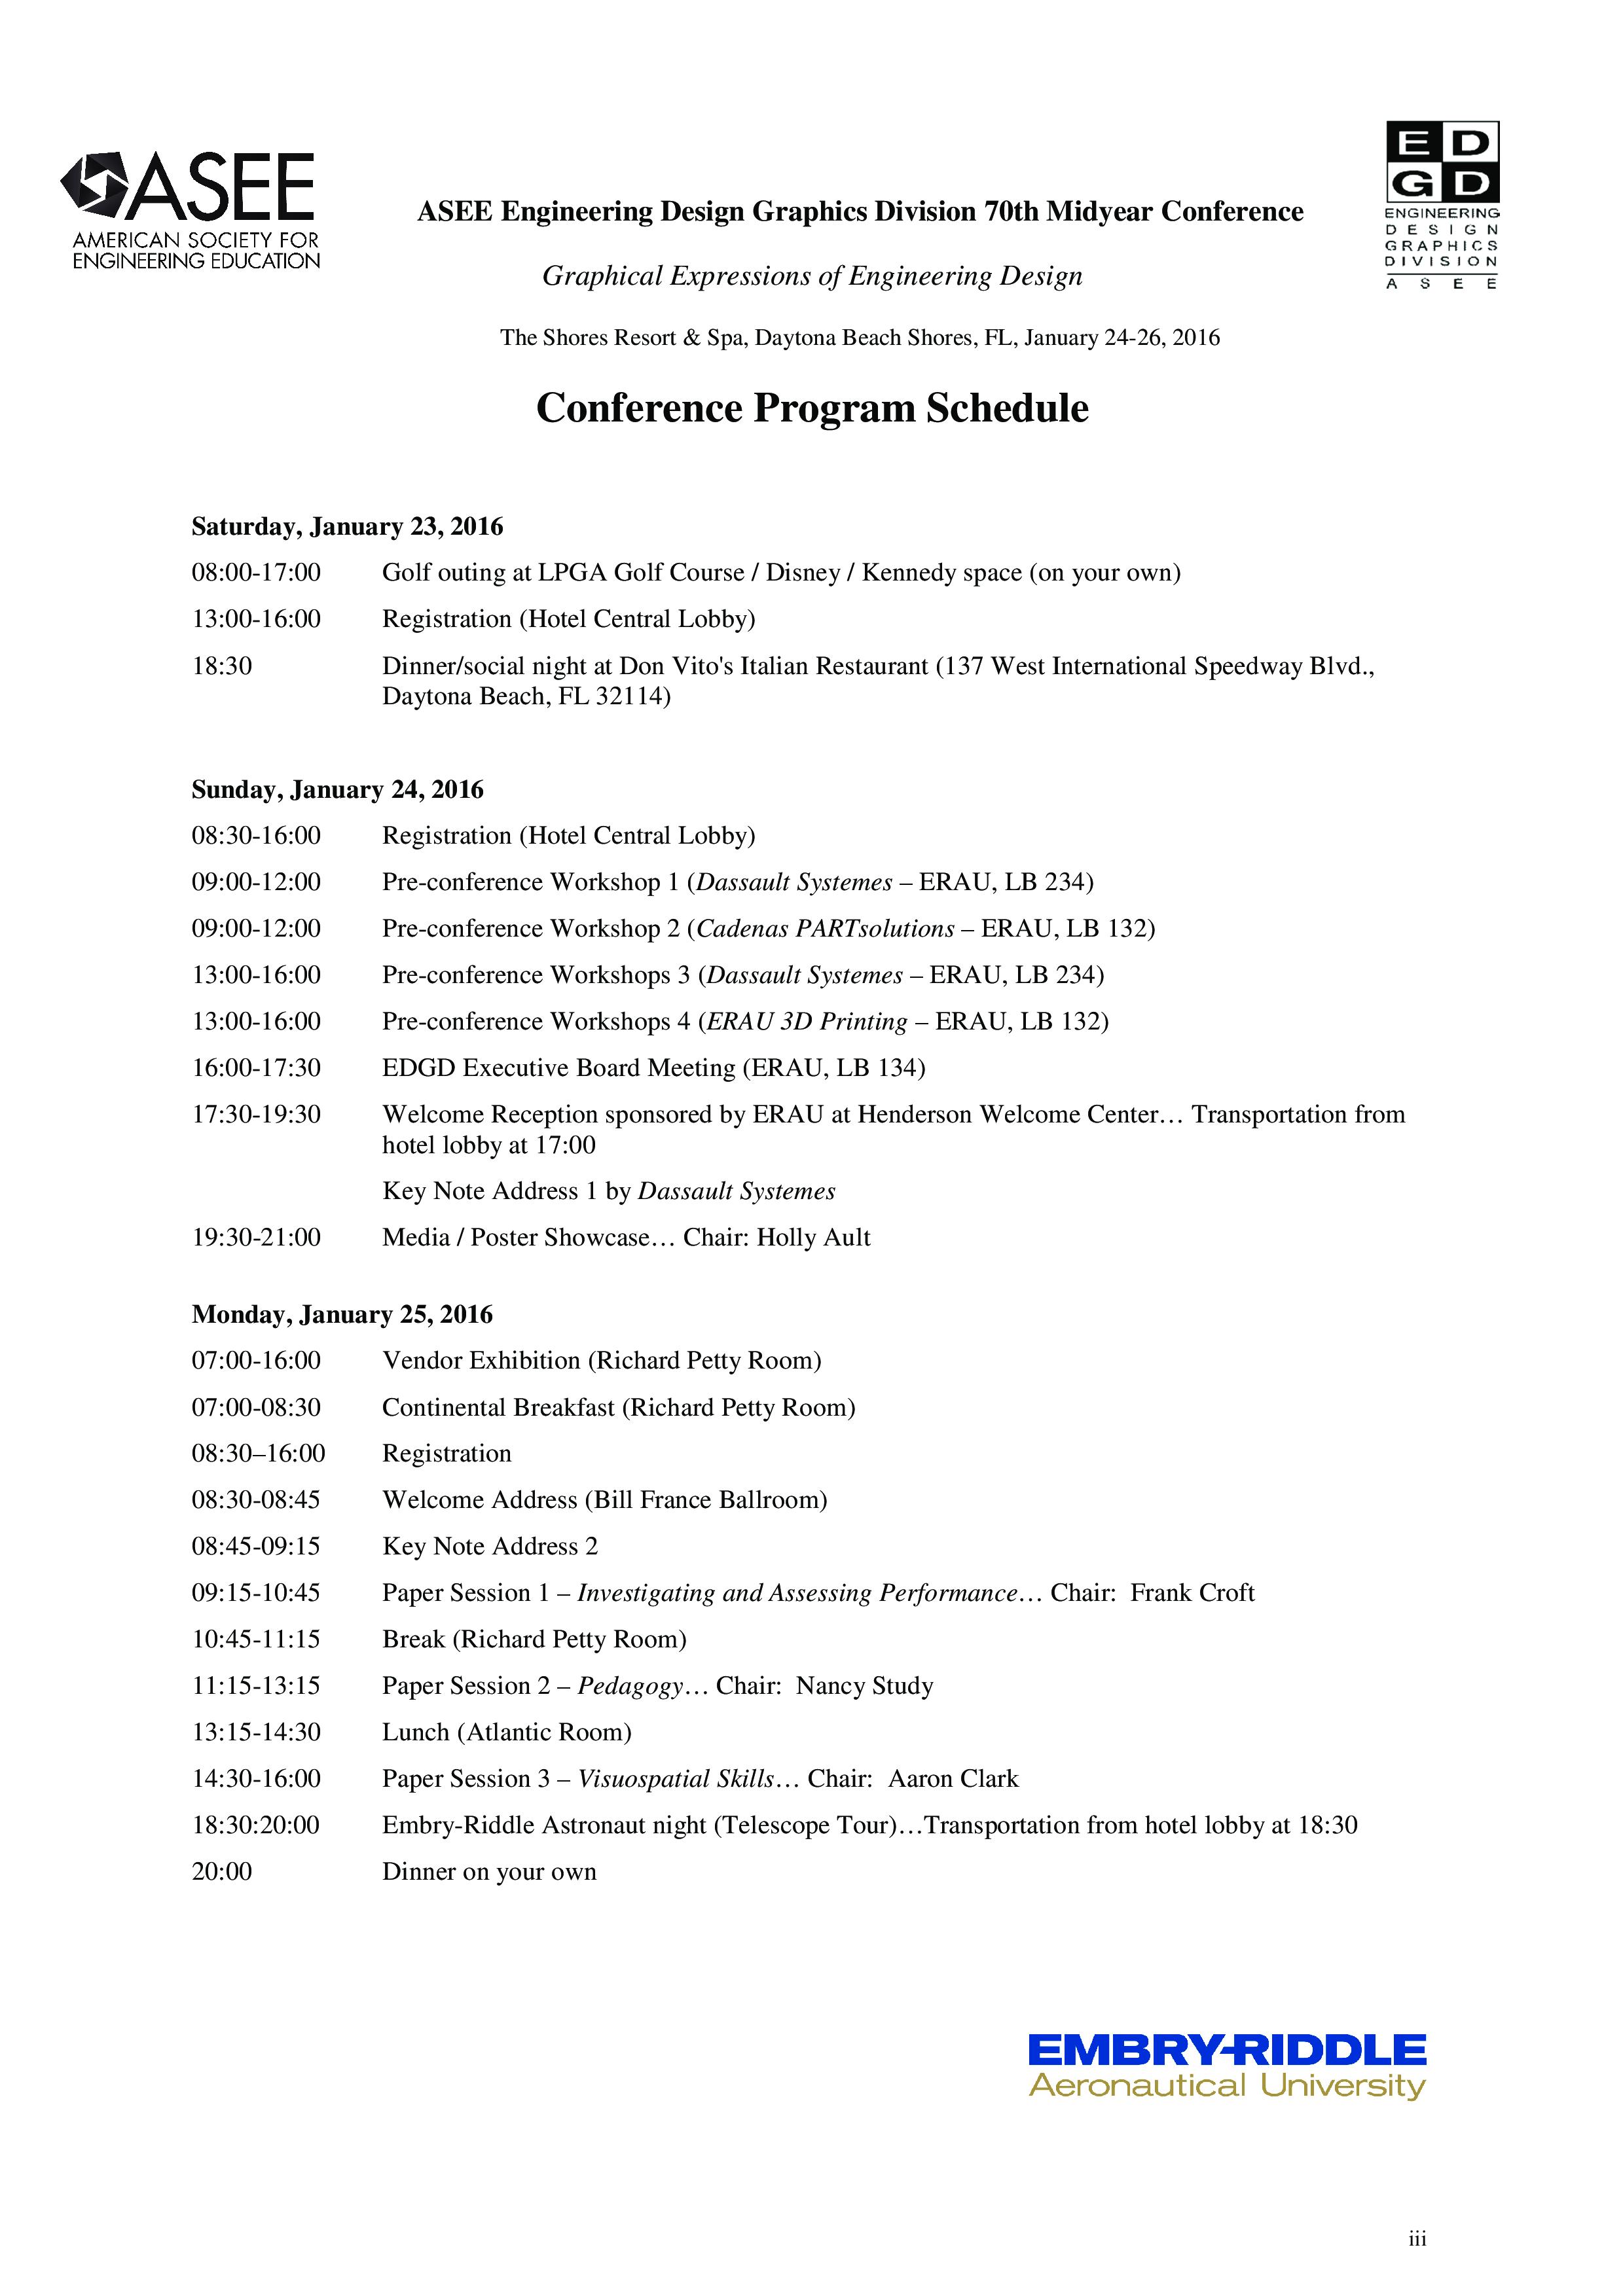 Free Conference Program | Templates at allbusinesstemplates.com